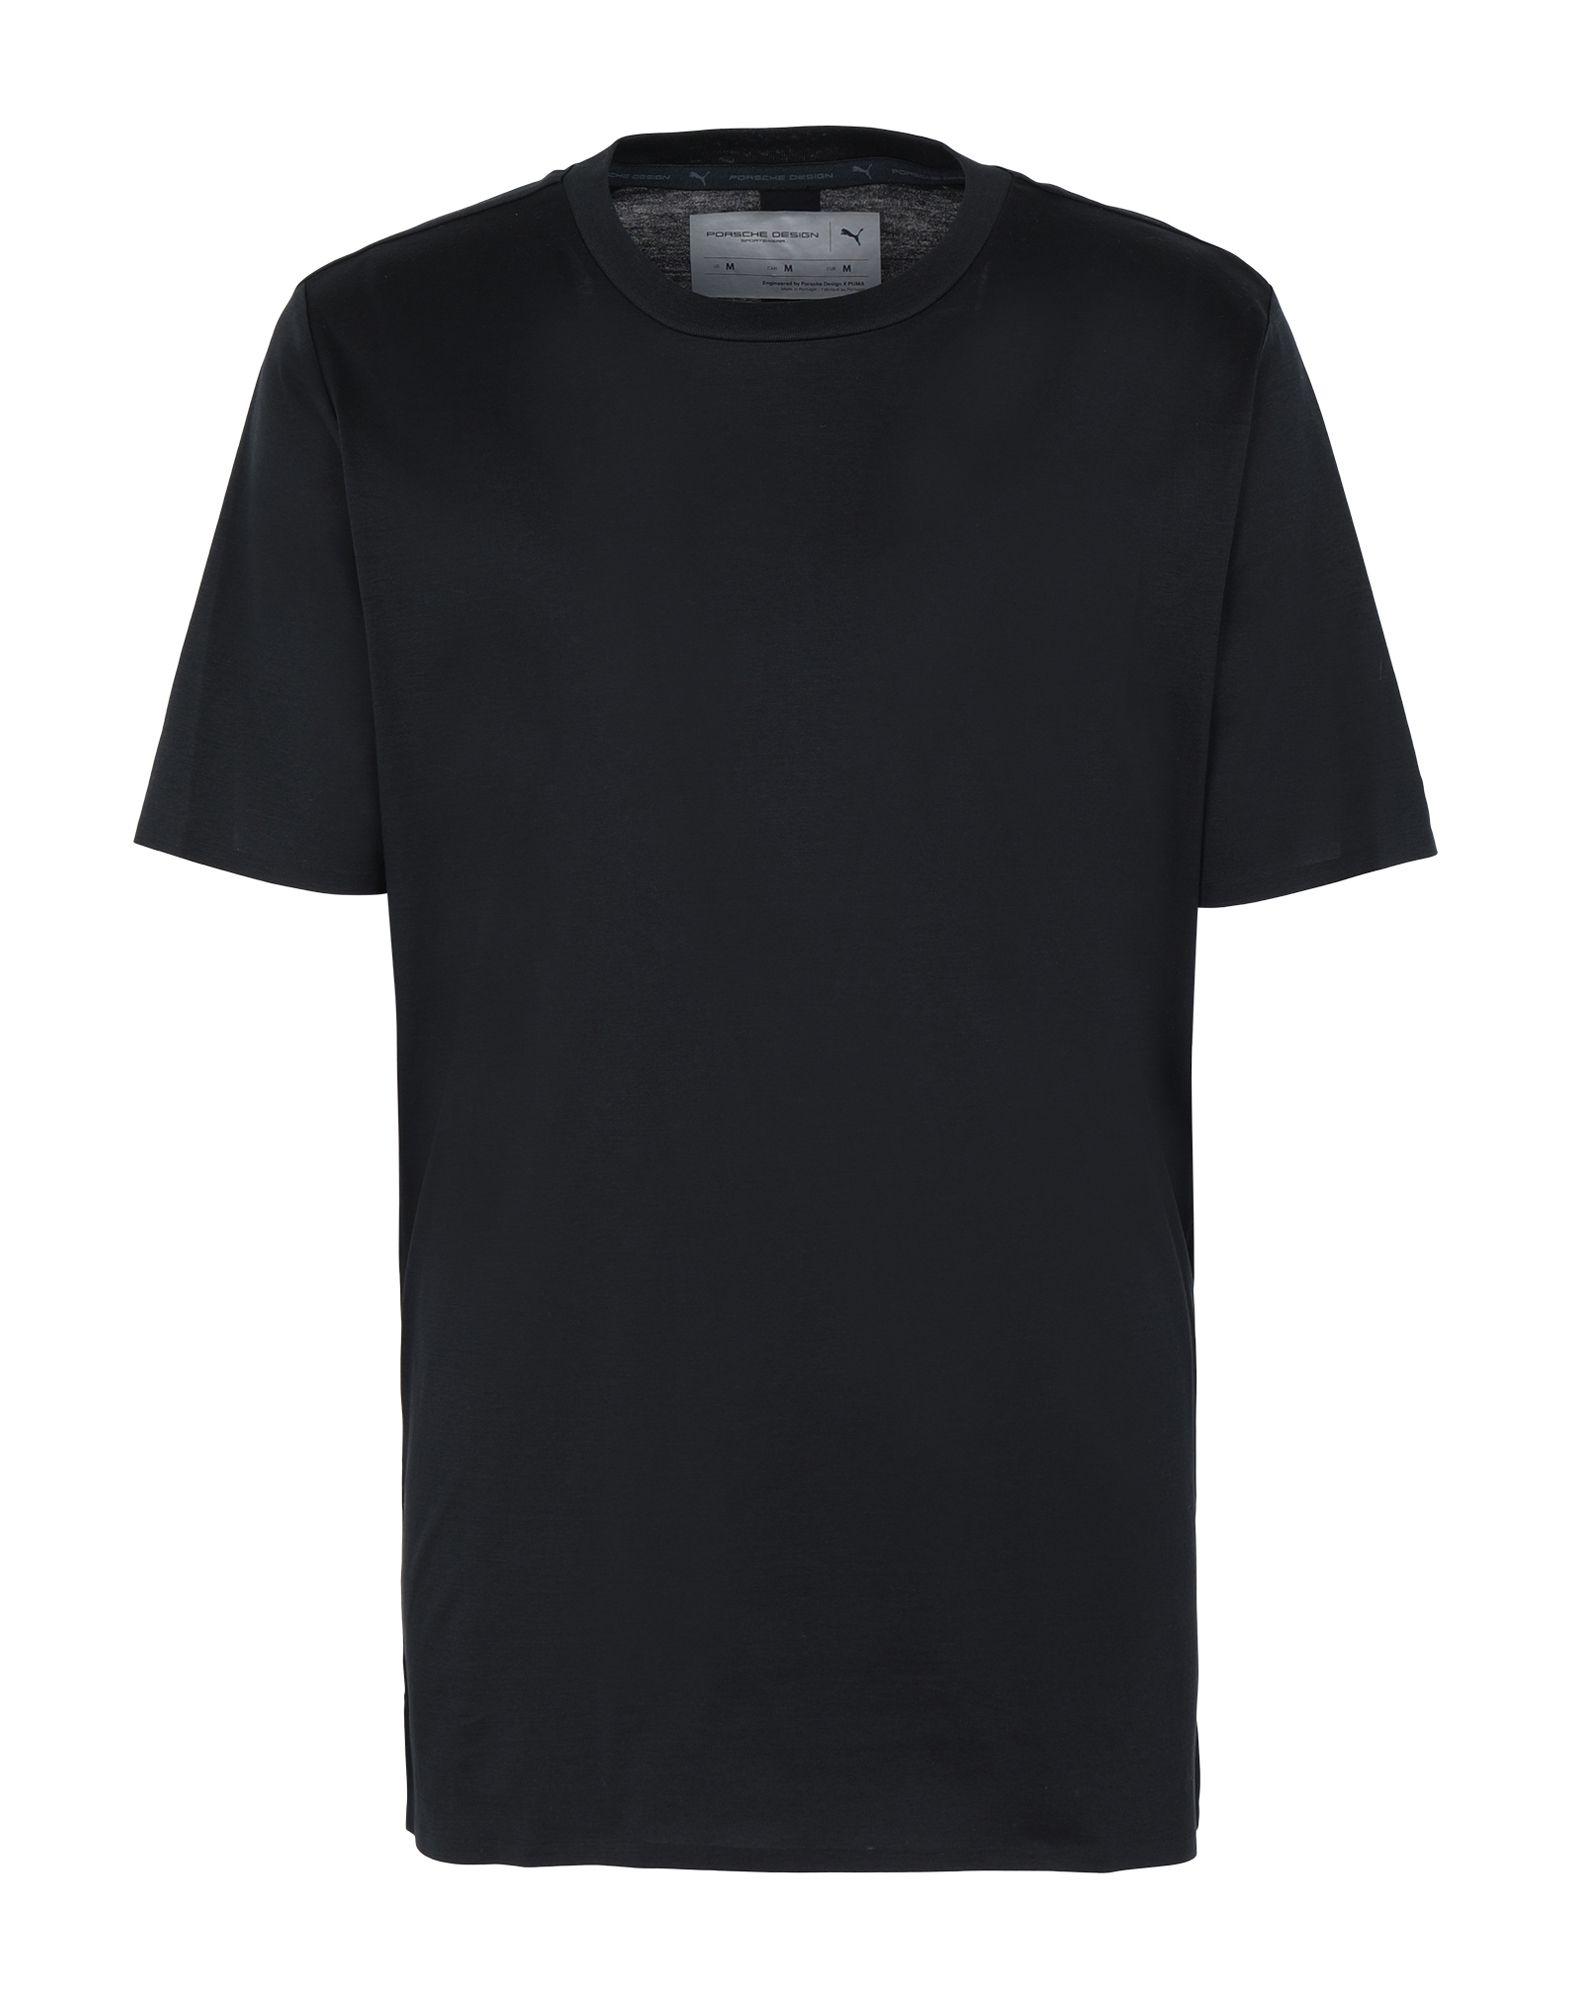 Фото - PUMA x PORSCHE DESIGN Футболка puma x porsche design футболка